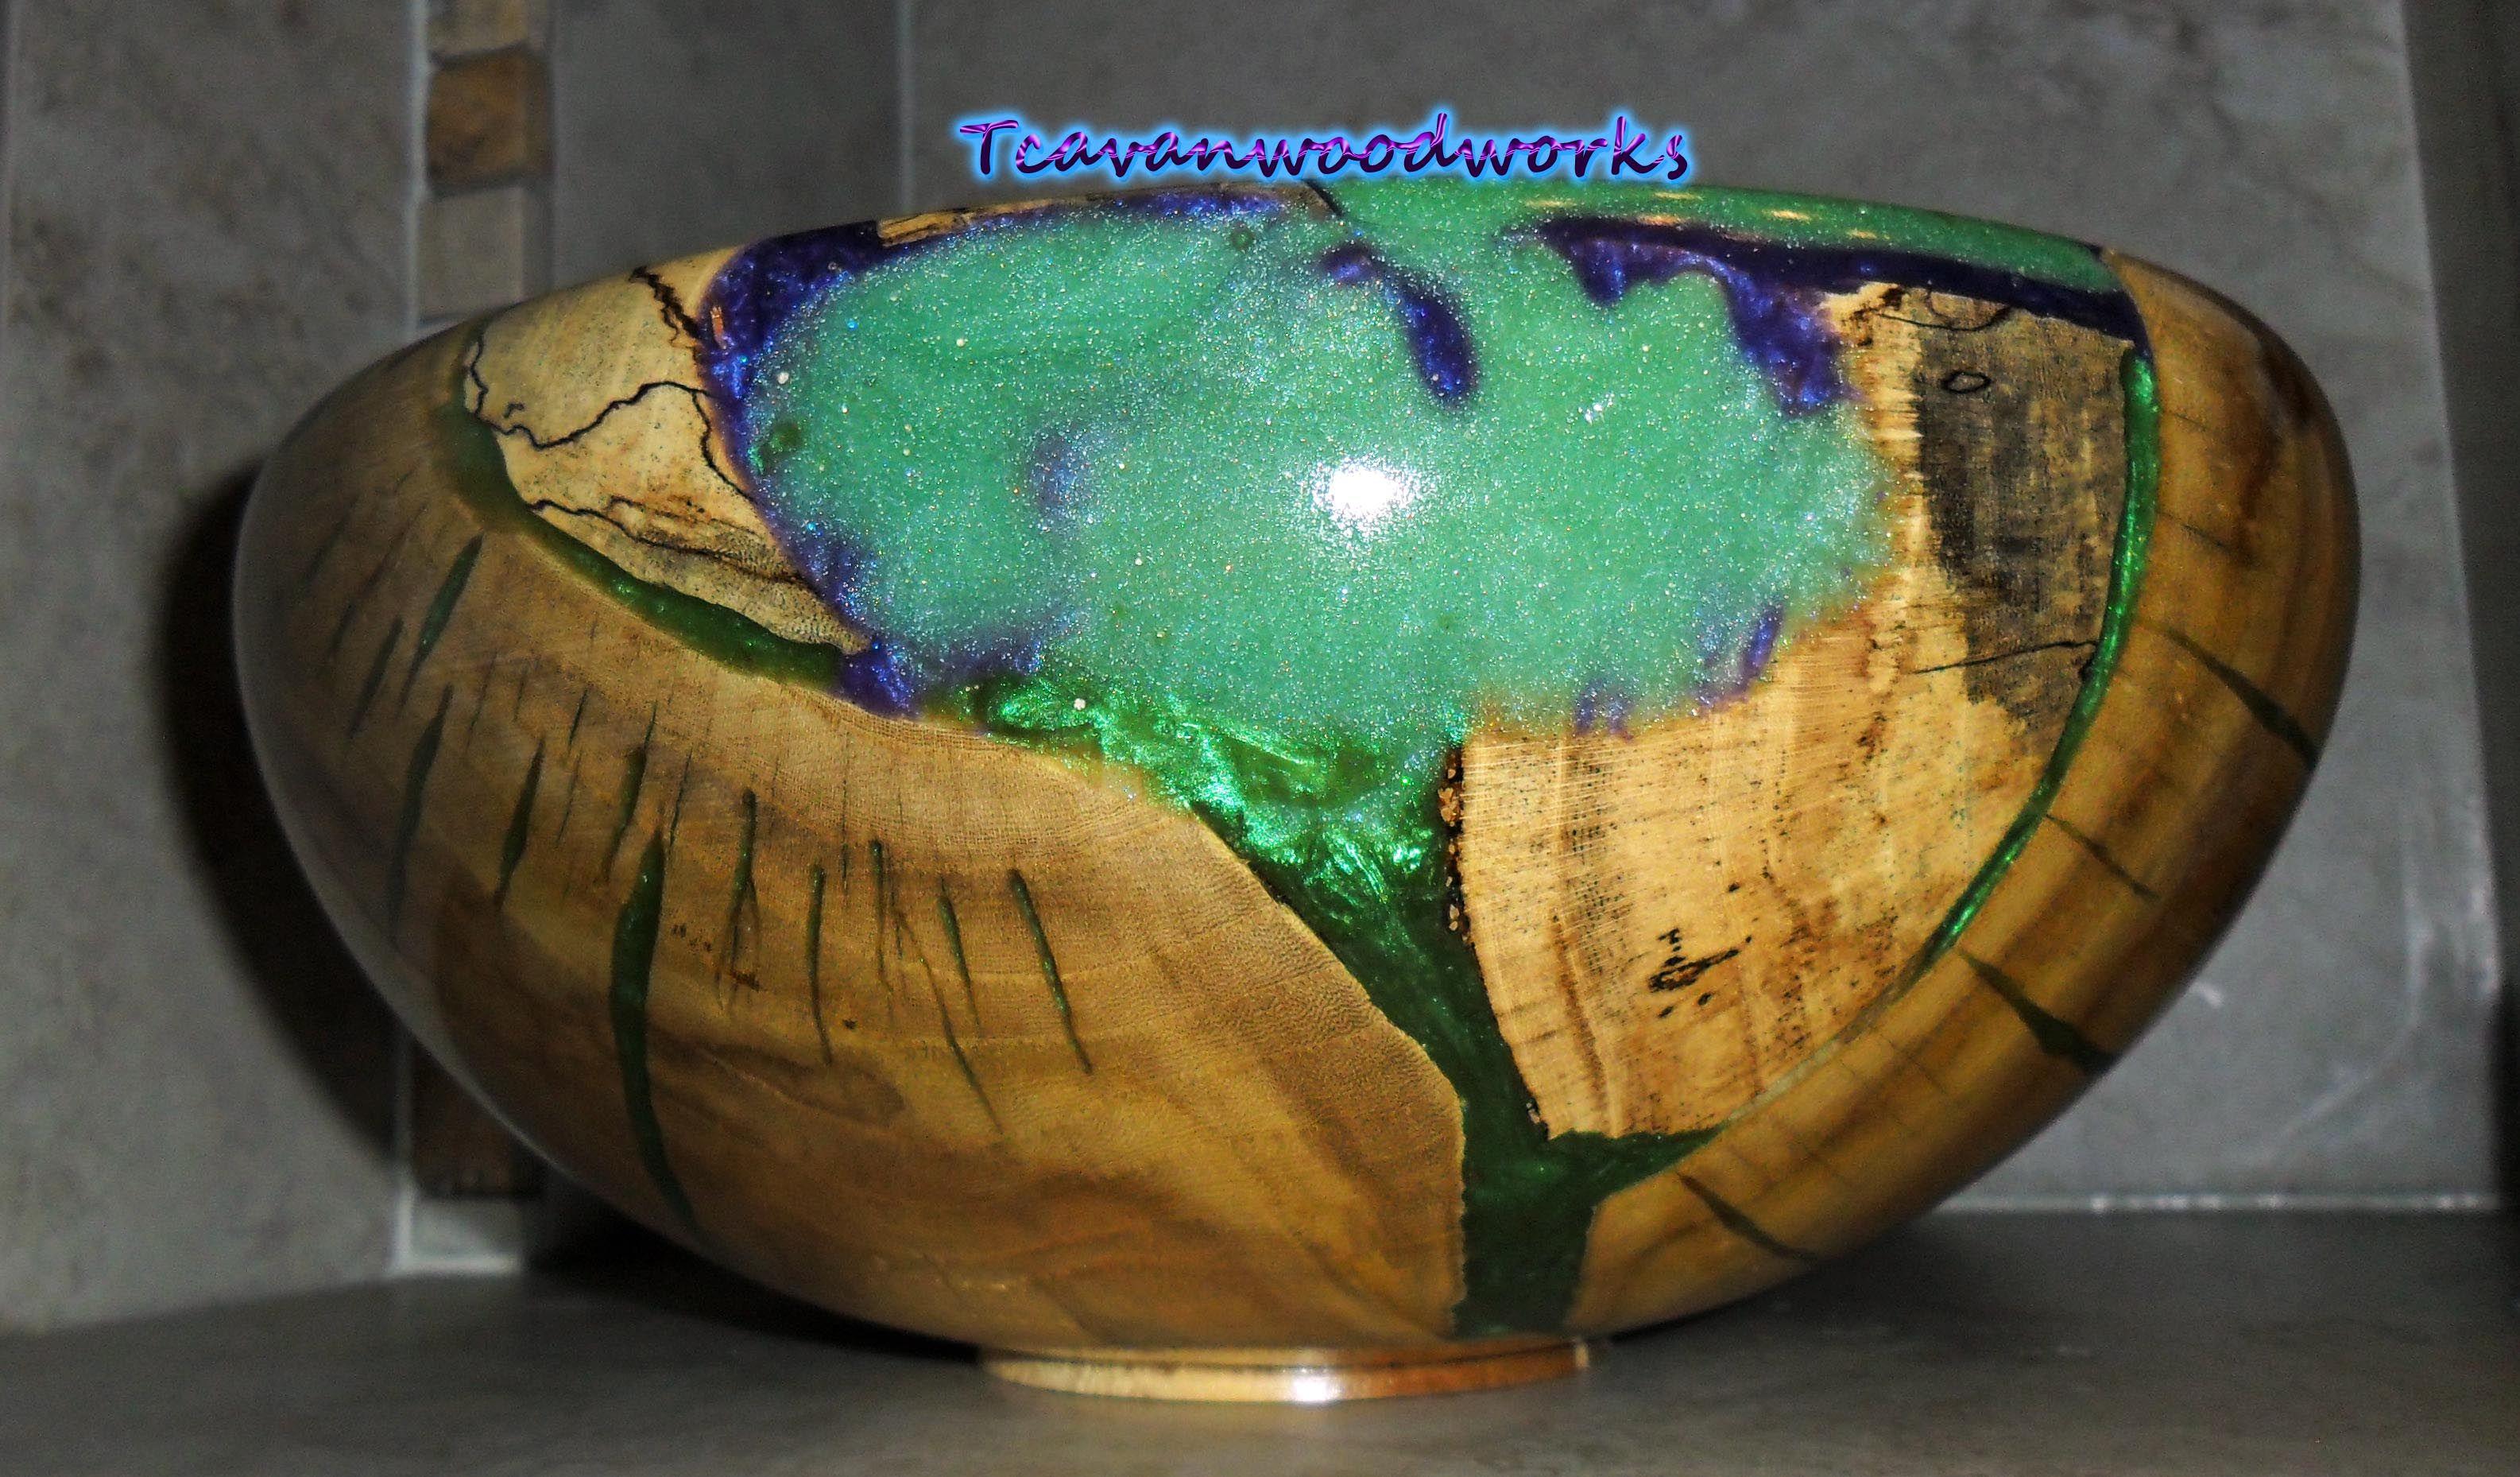 Epoxy Resin Wood Bowl Hybrid Wood Resin Wood Inlays